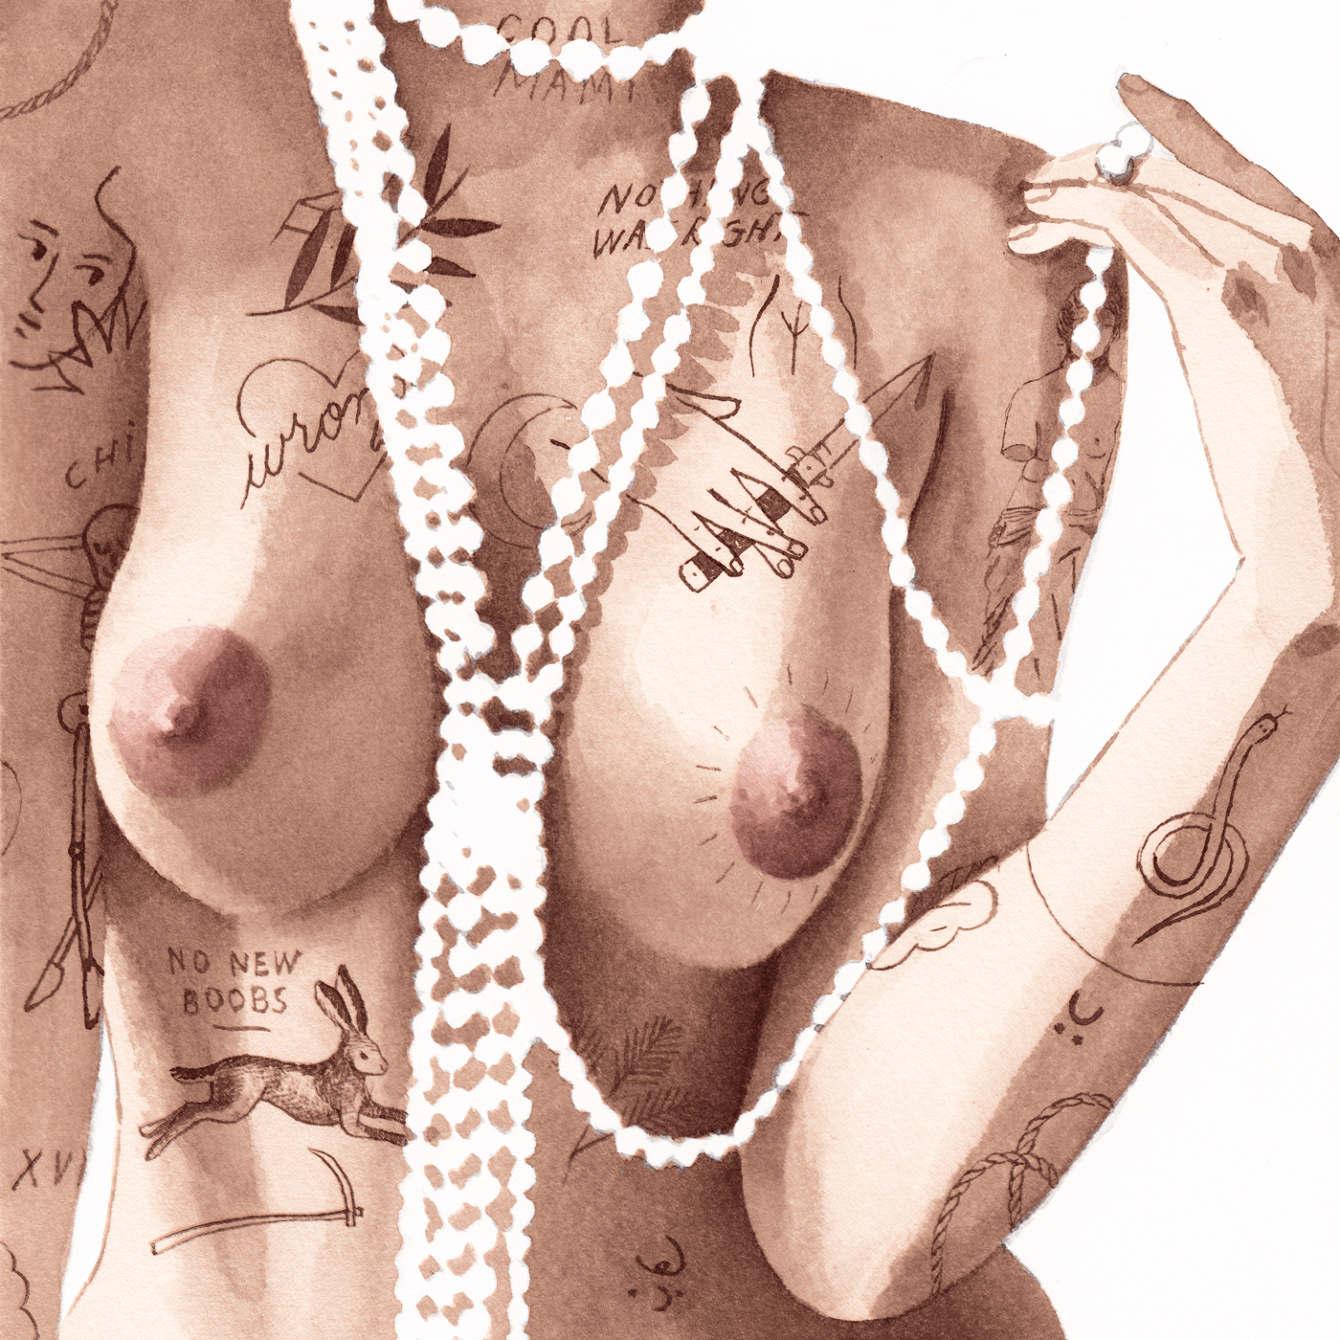 I corpi tatuati NSFW Jean Andre | Collater.al 16